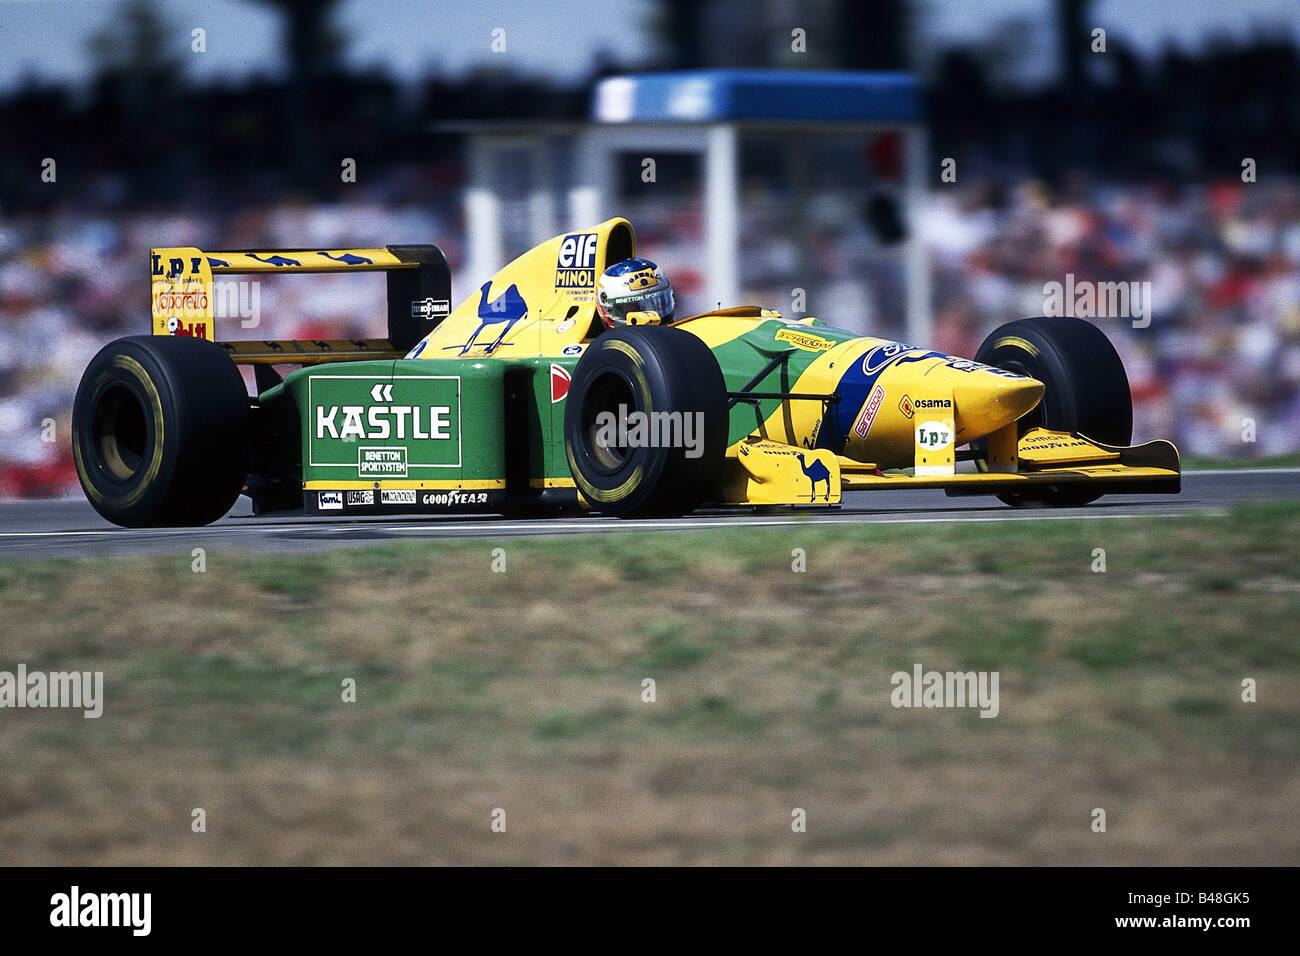 Schumacher, Michael, * 3.1.1969, German athlete (automobile racer), formula one race, Grand Prix Hockenheim, Germany, - Stock Image